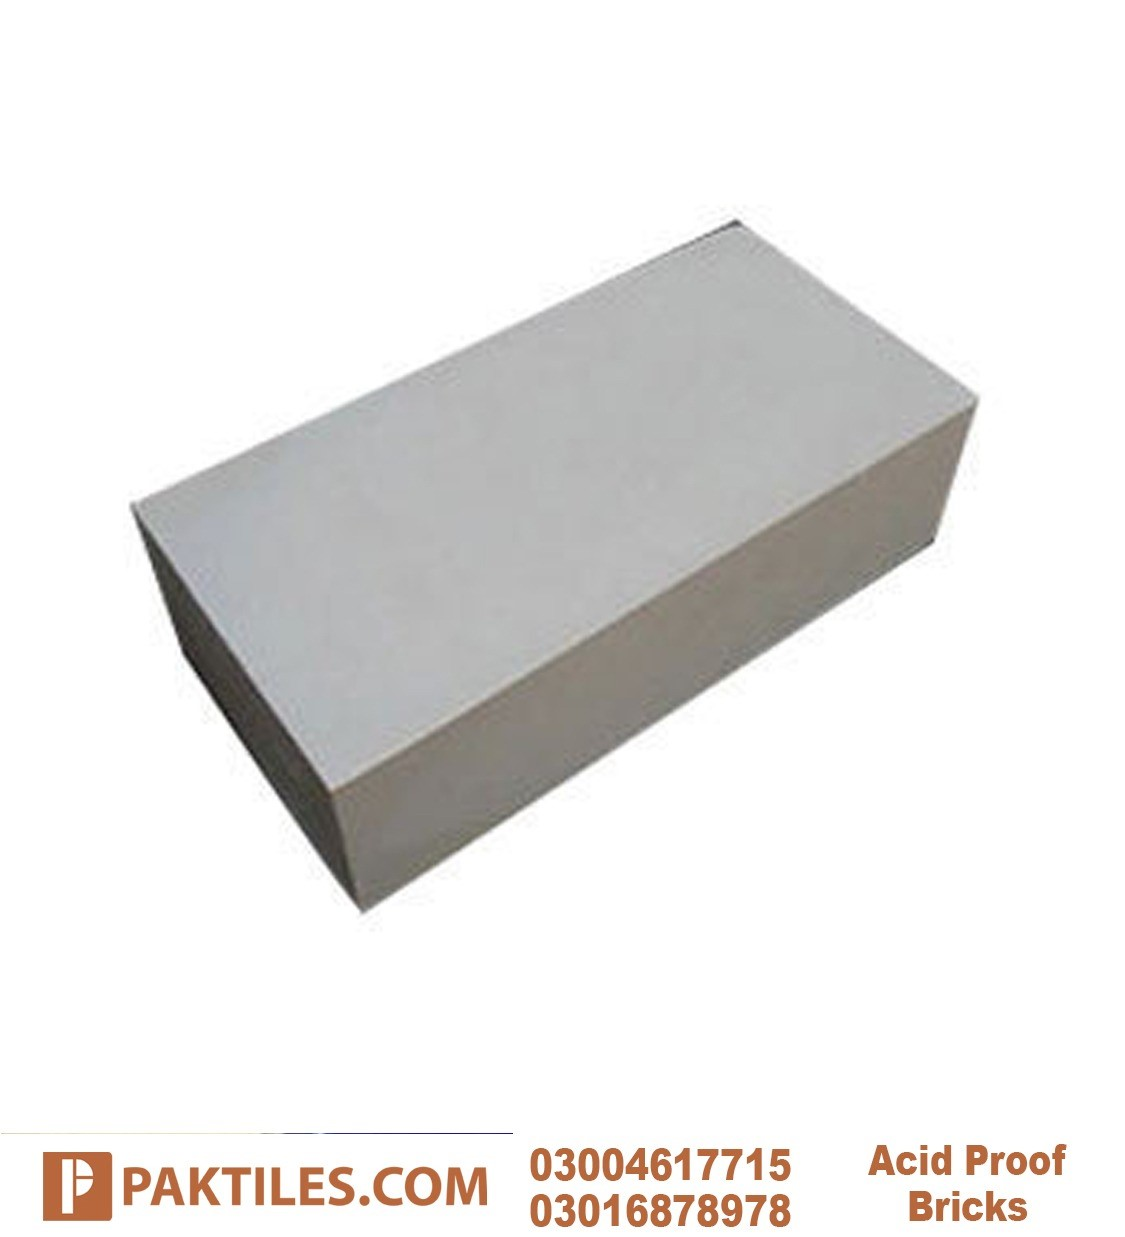 Acid wash tiles price Acid Proof Tiles Suppliers